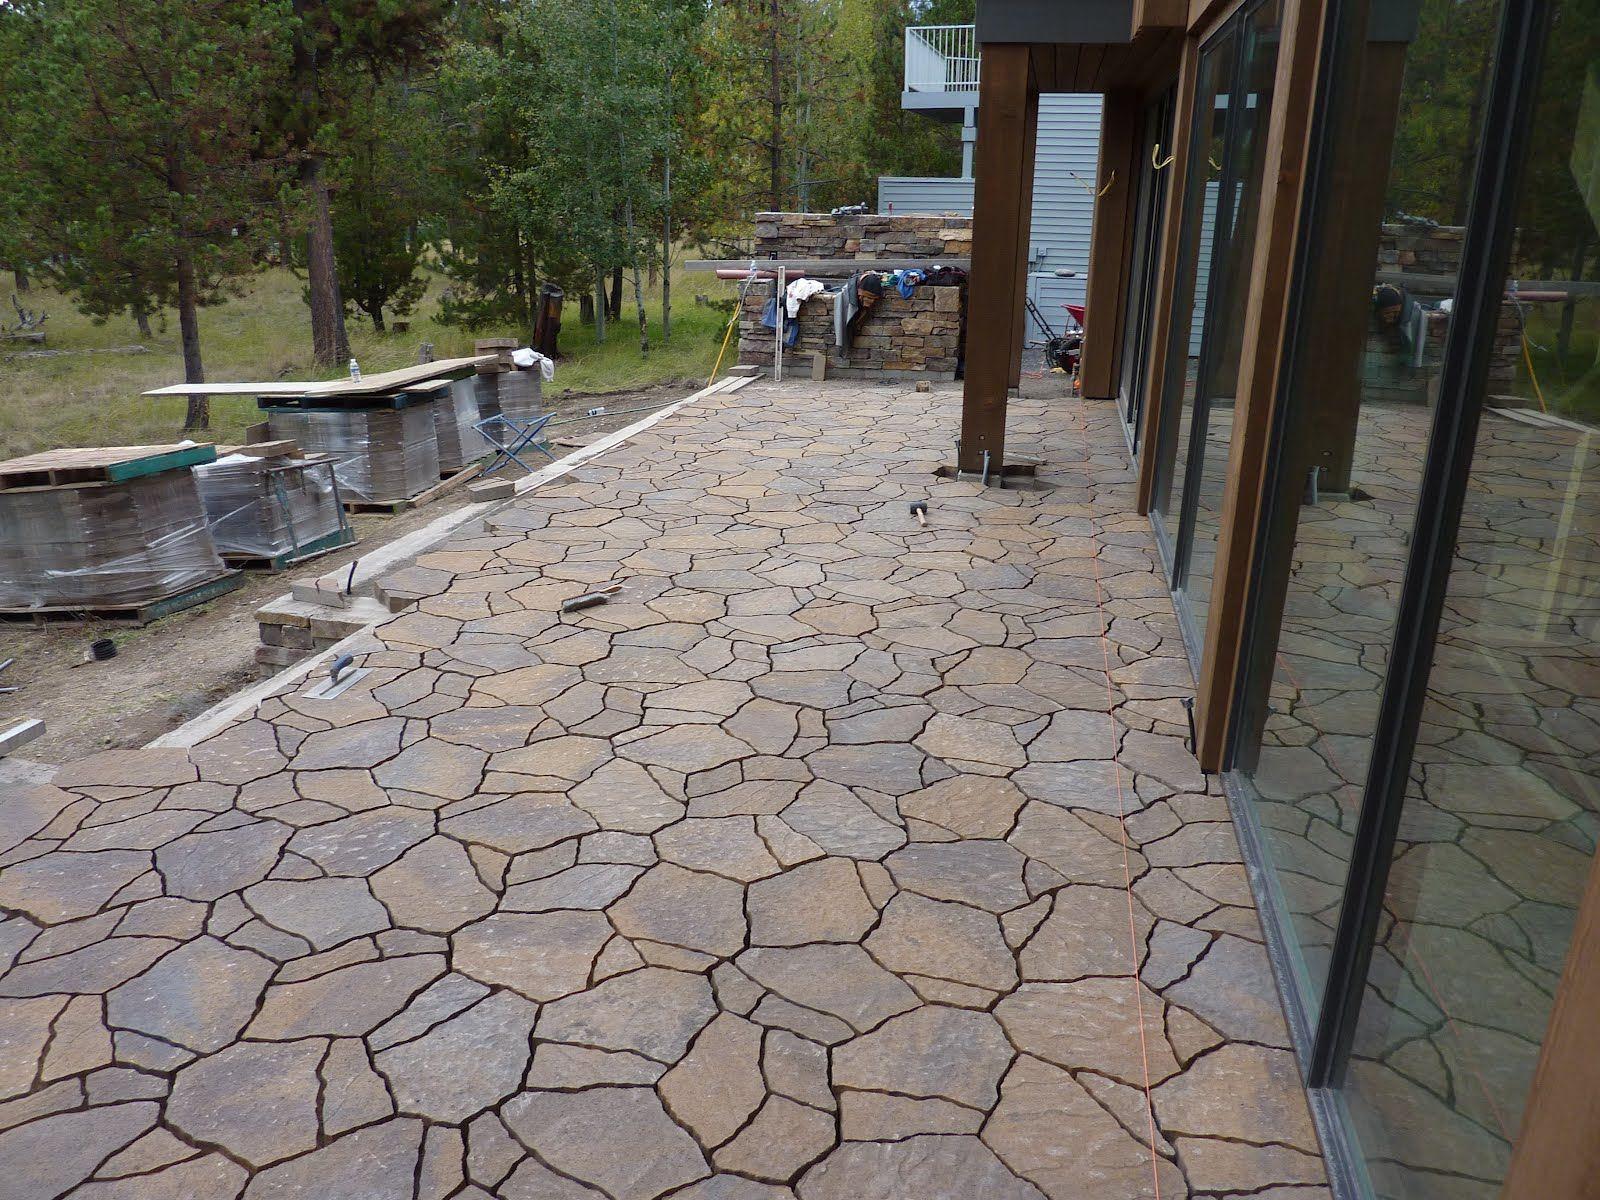 Perfect Patio Paver Design Ideas Outdoor Patio Pavers Patio Stones Patio